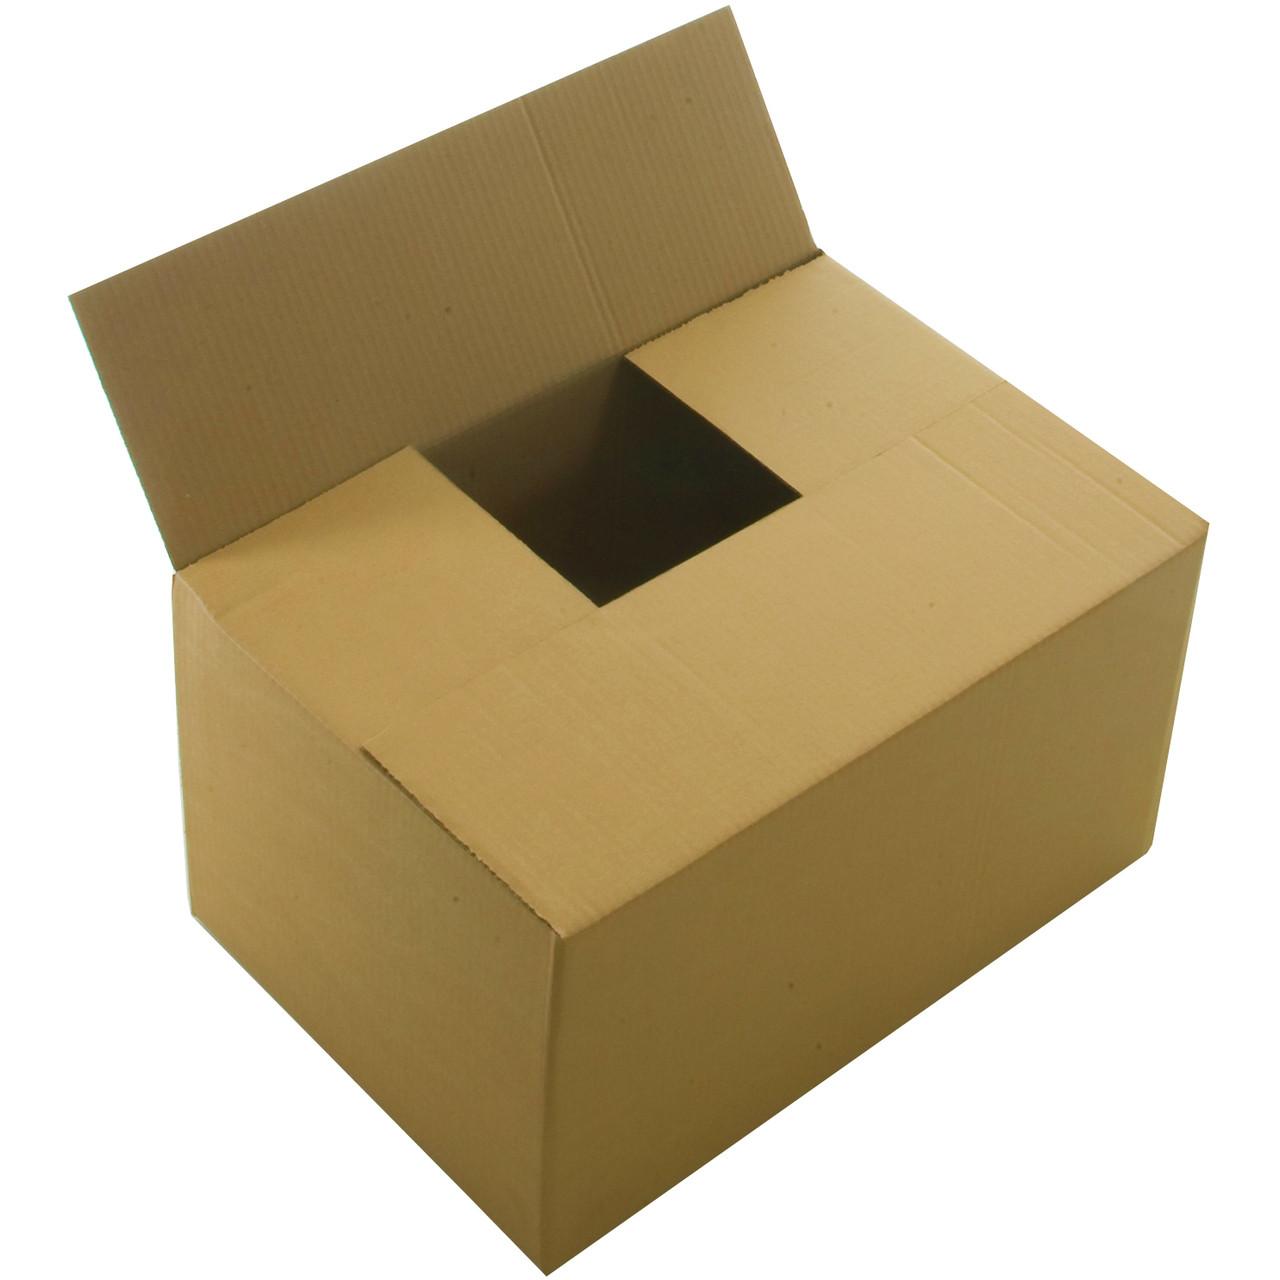 d60386cfabf Double Wall Cardboard Box 610mm x 457mm x 457mm 15 Pack